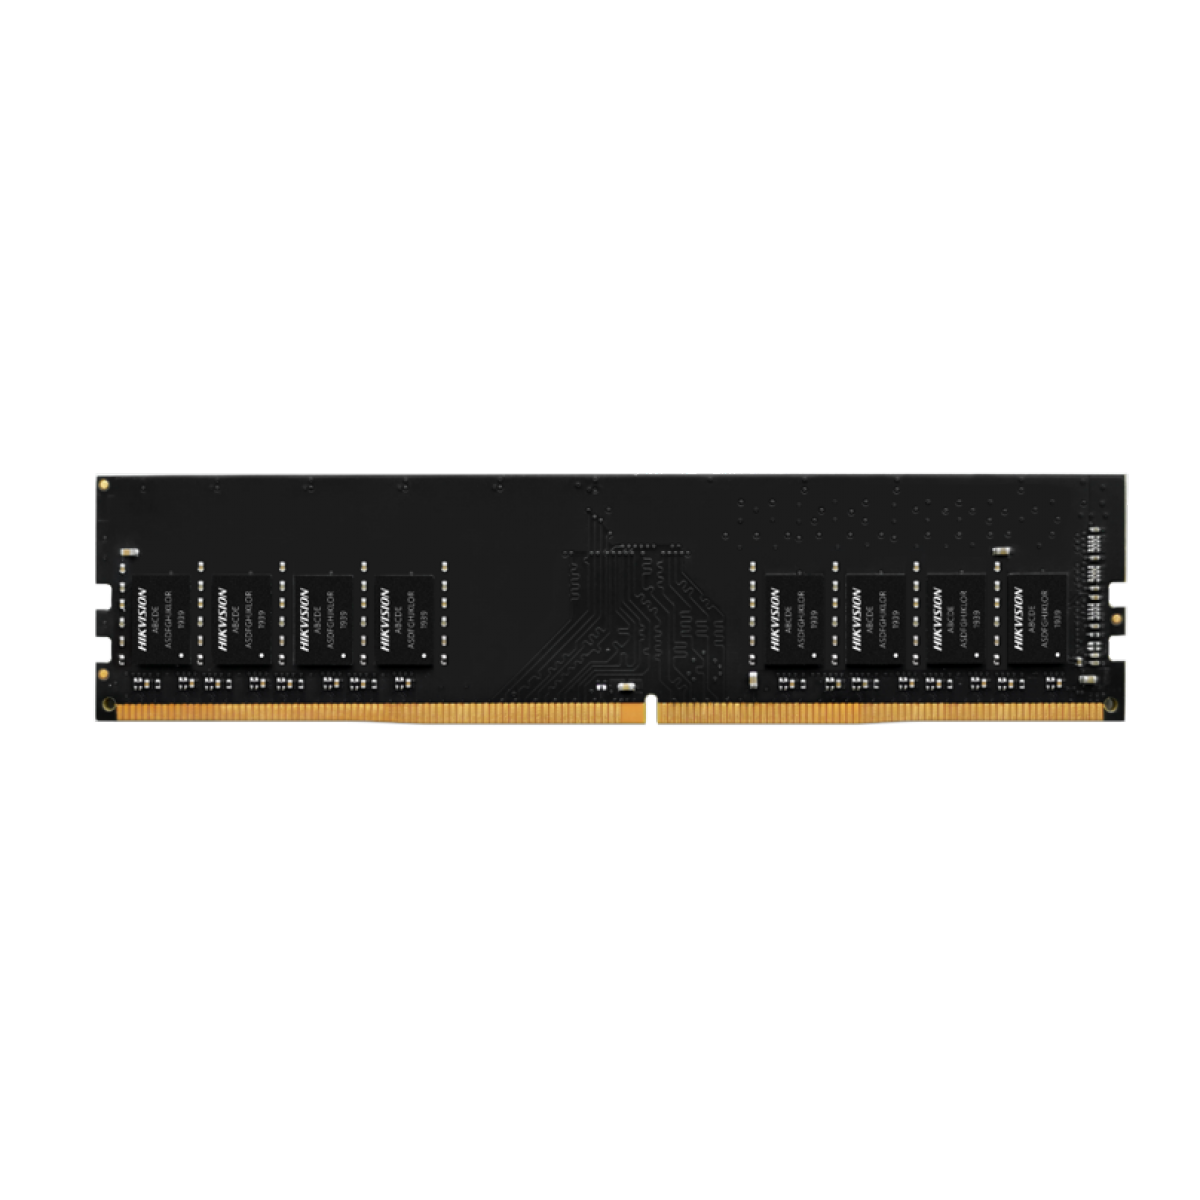 Memória DDR3 Hikvision U1, 8GB 1600MHz, HKED3081BAA2A0ZA1